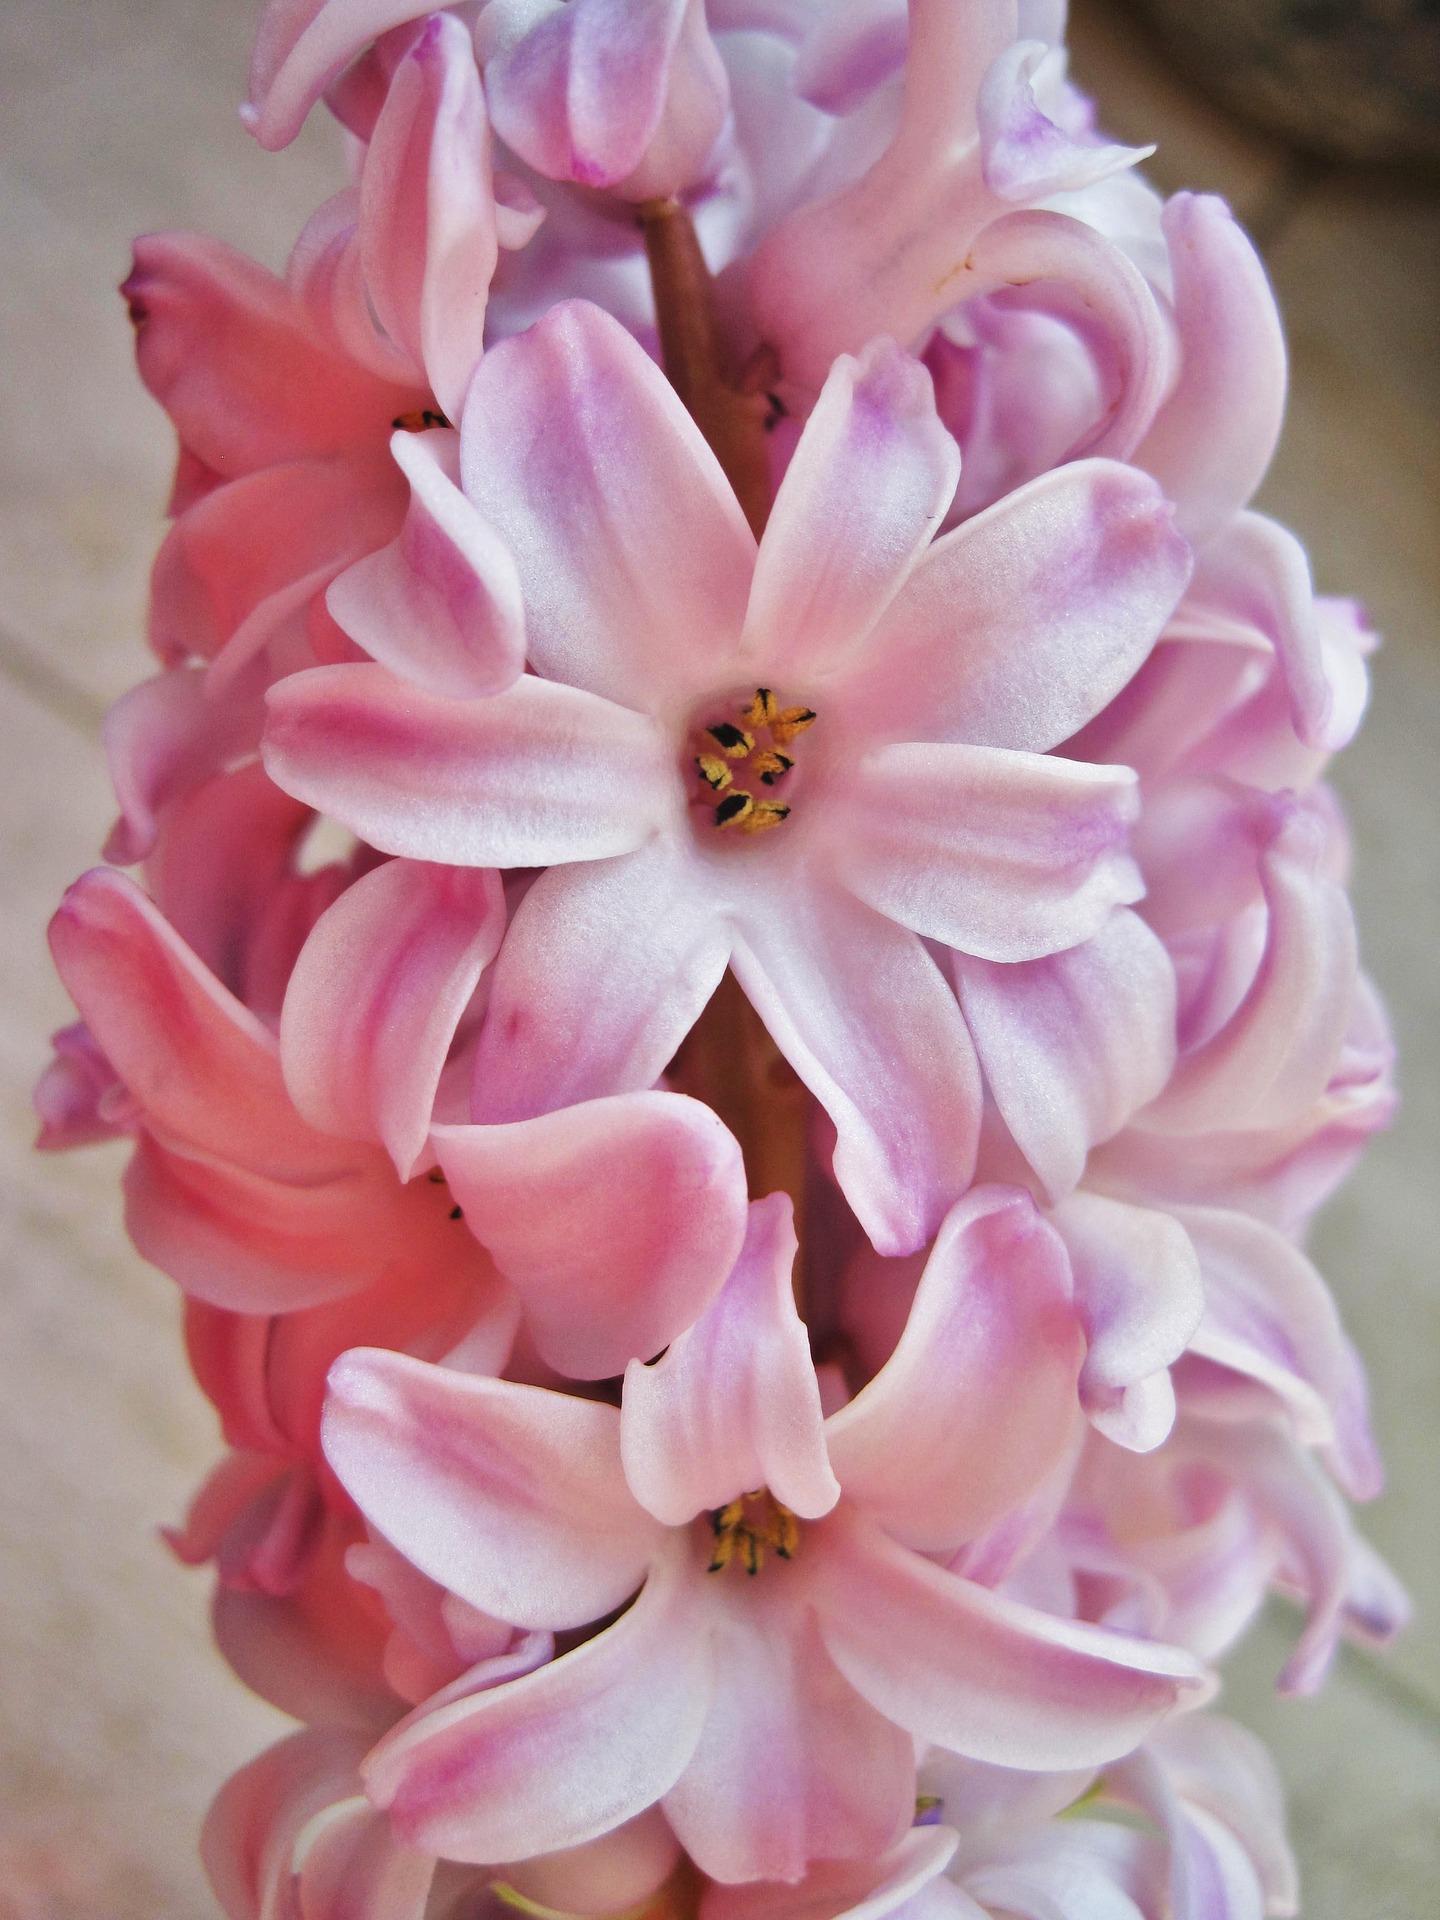 pink-hyacinth-1188069_1920.jpg